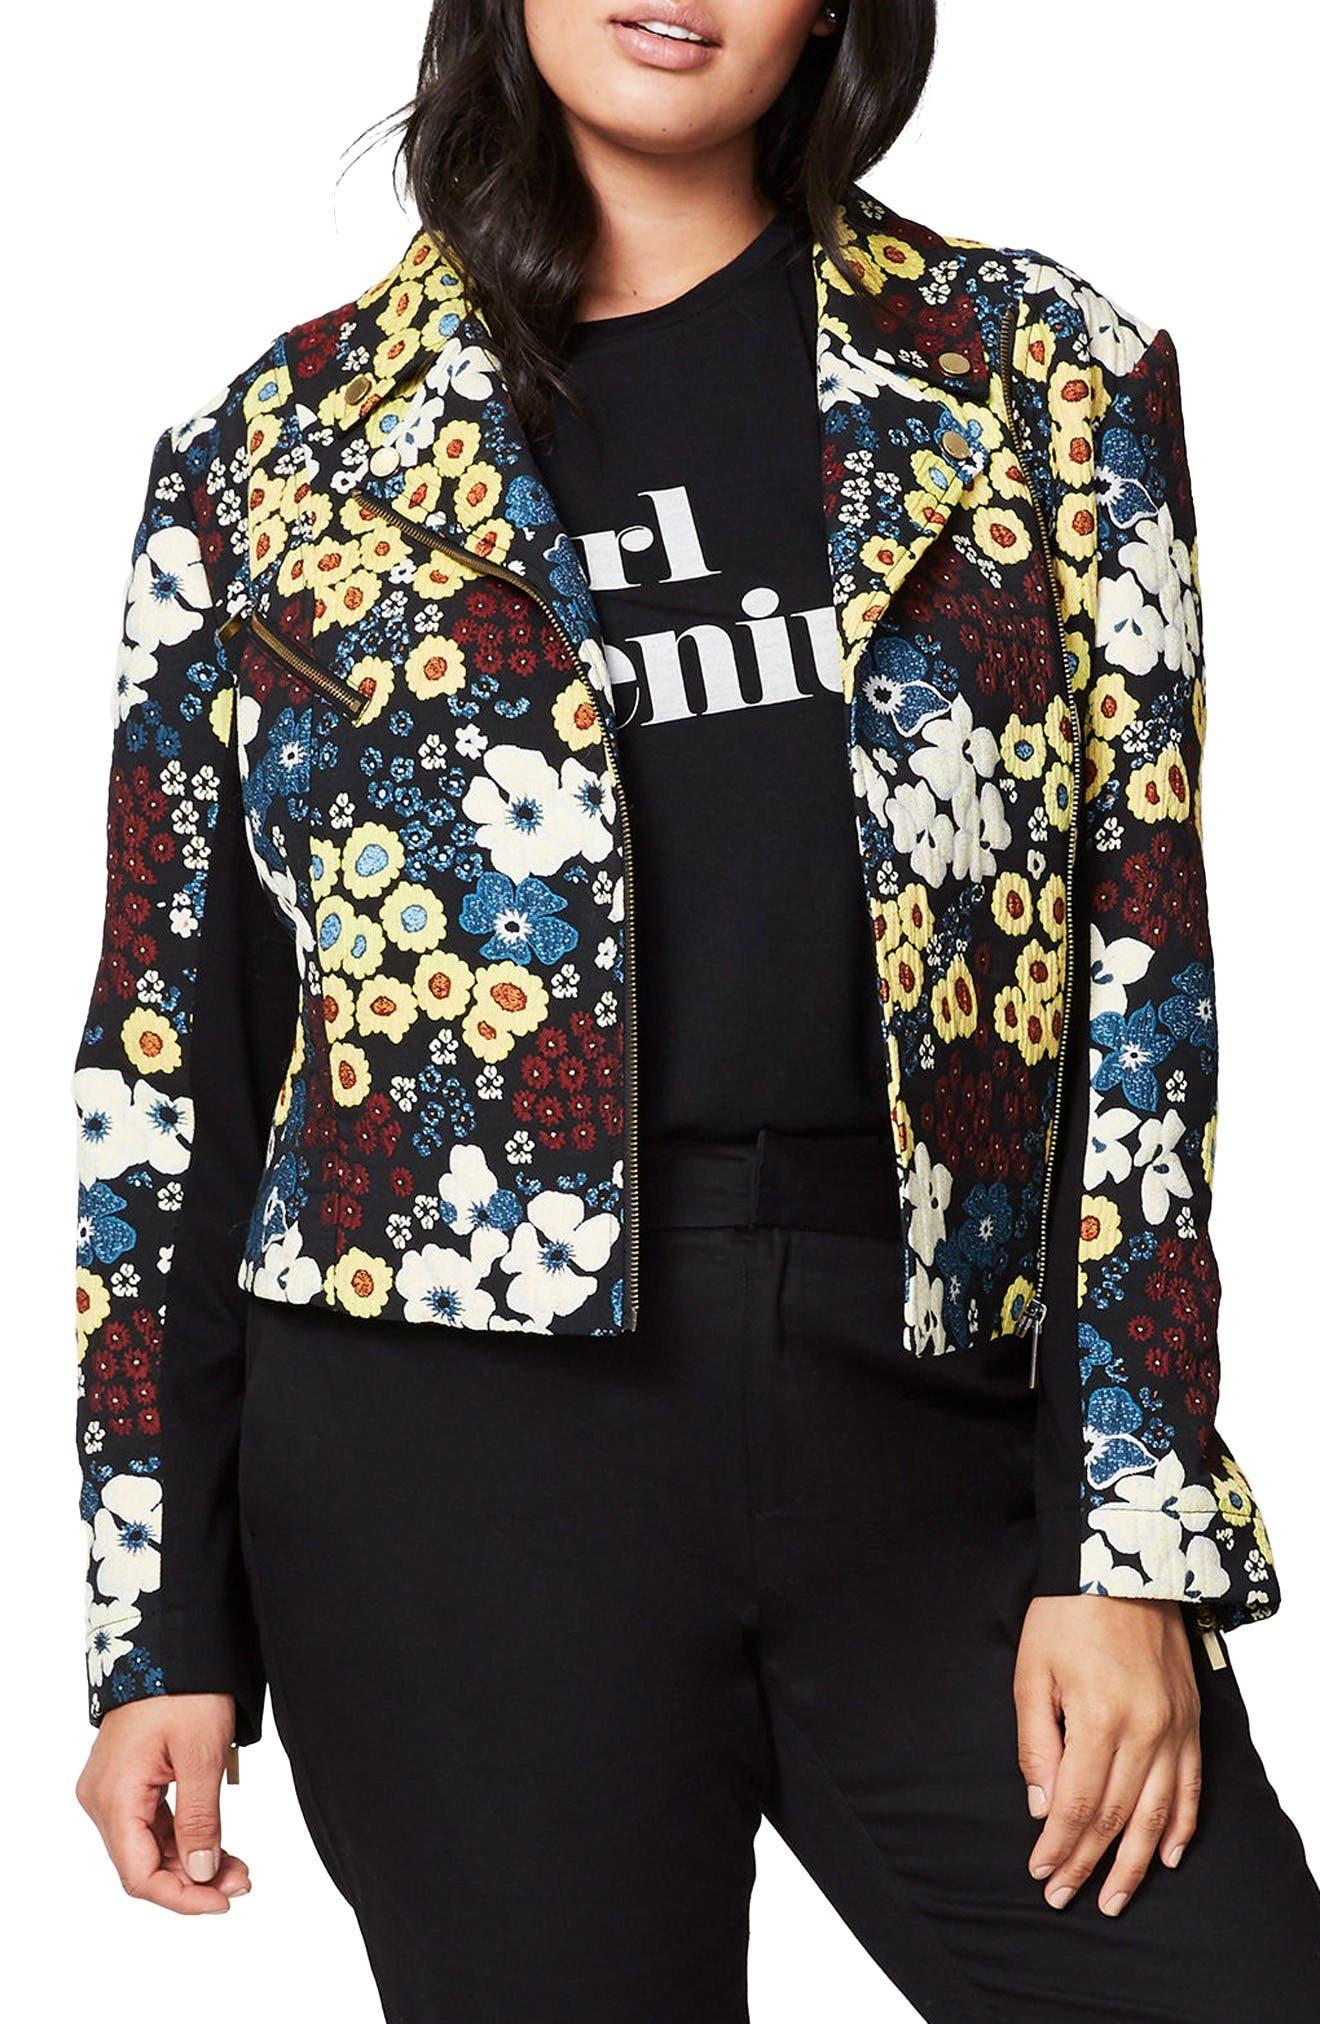 Alternate Image 1 Selected - RACHEL Rachel Roy Floral Moto Jacket (Plus Size)